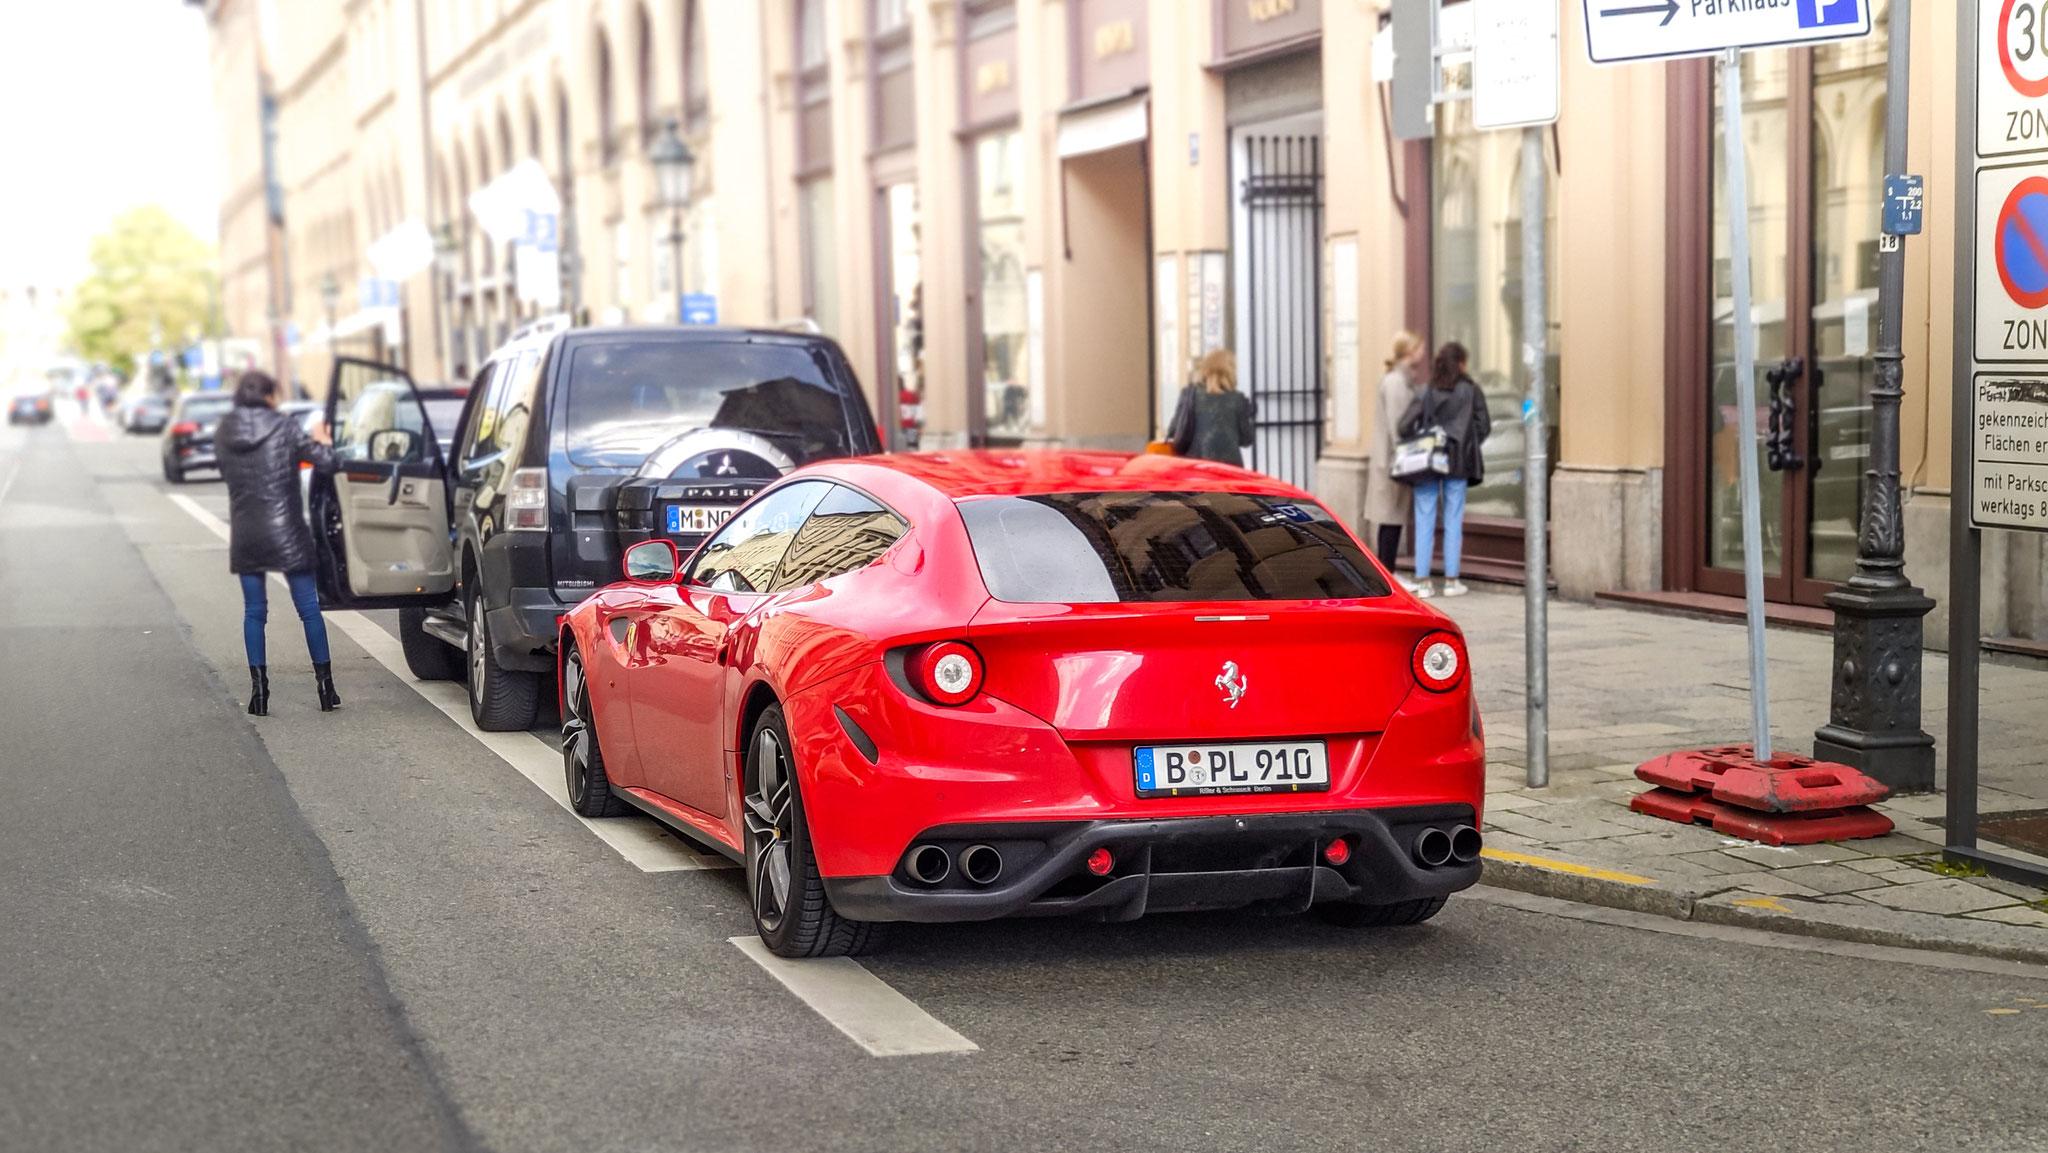 Ferrari FF - B-PL-910